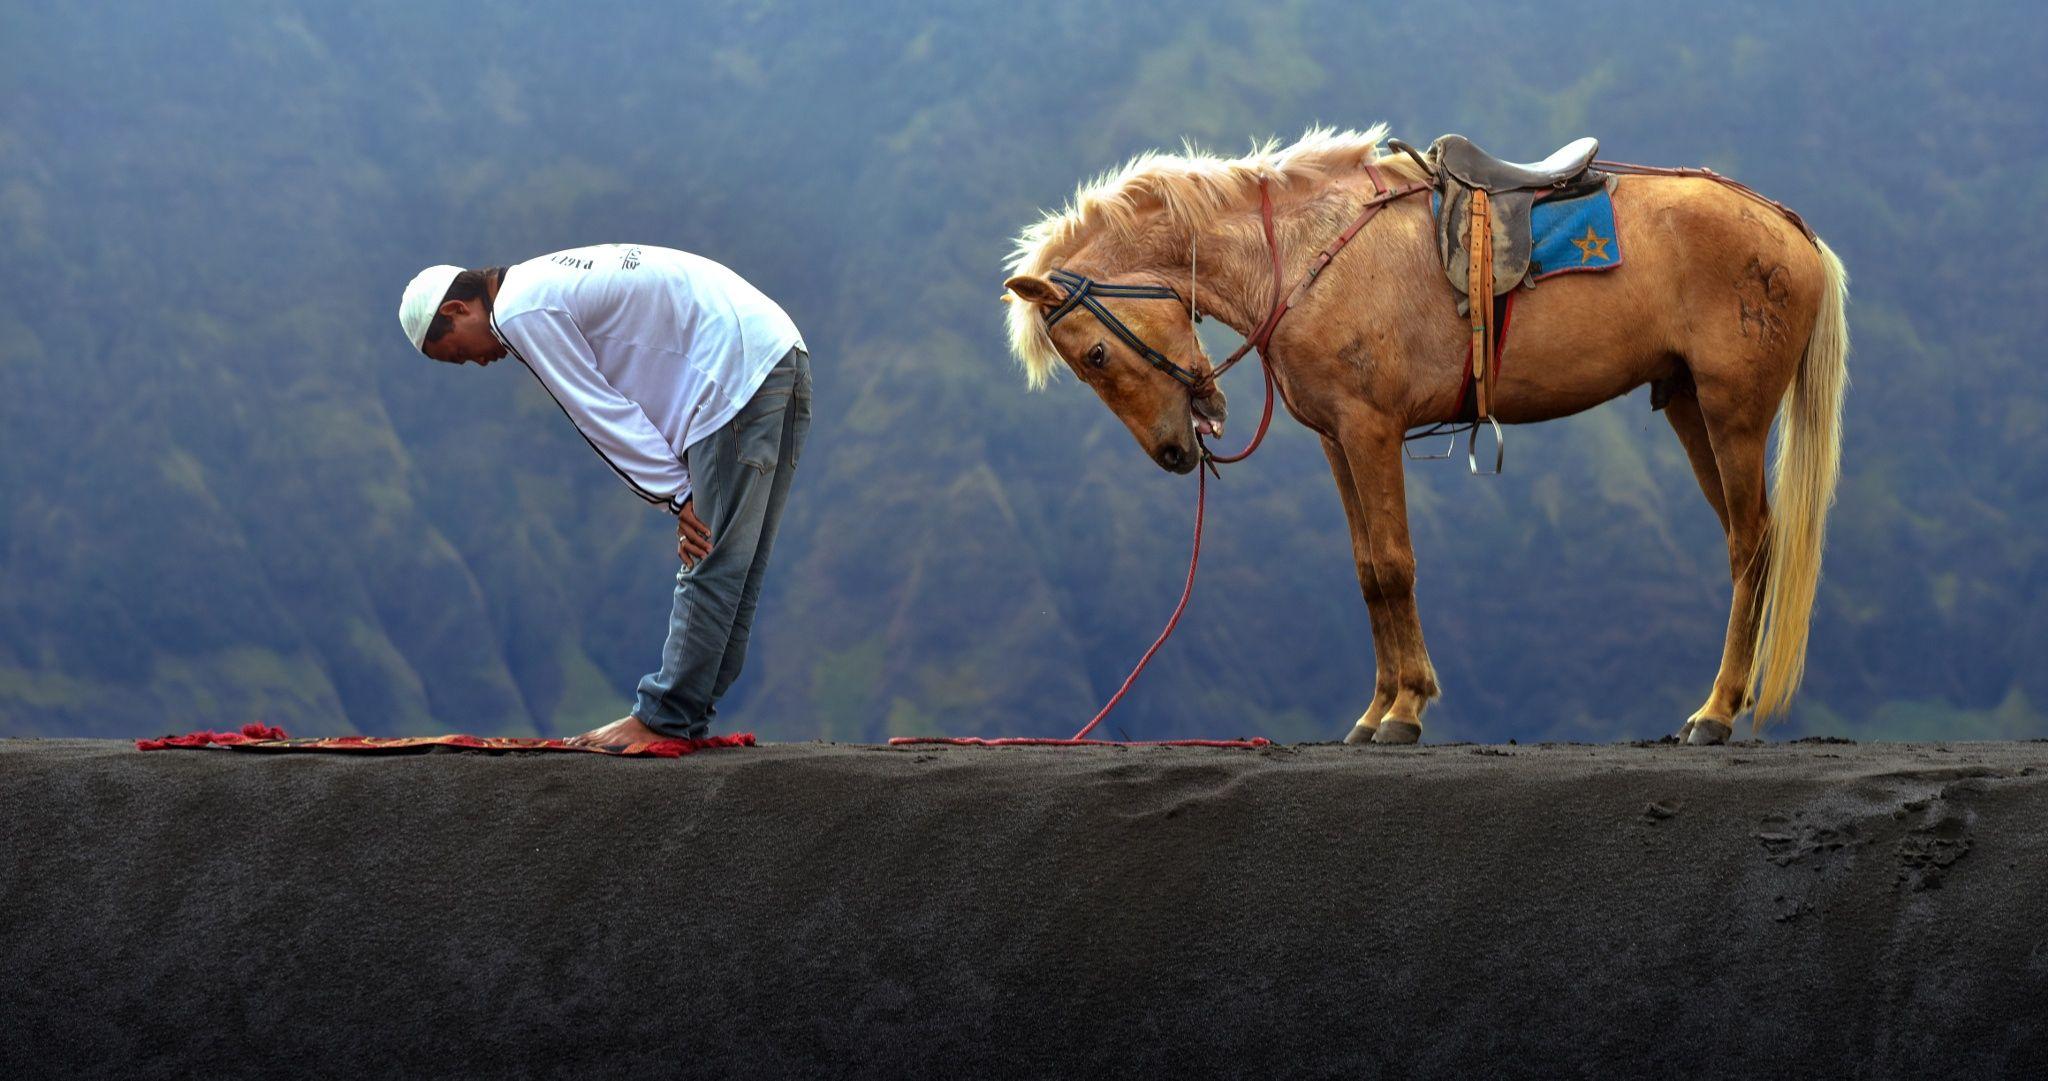 Fotografia Obedience de Fahmi Bhs na 500px